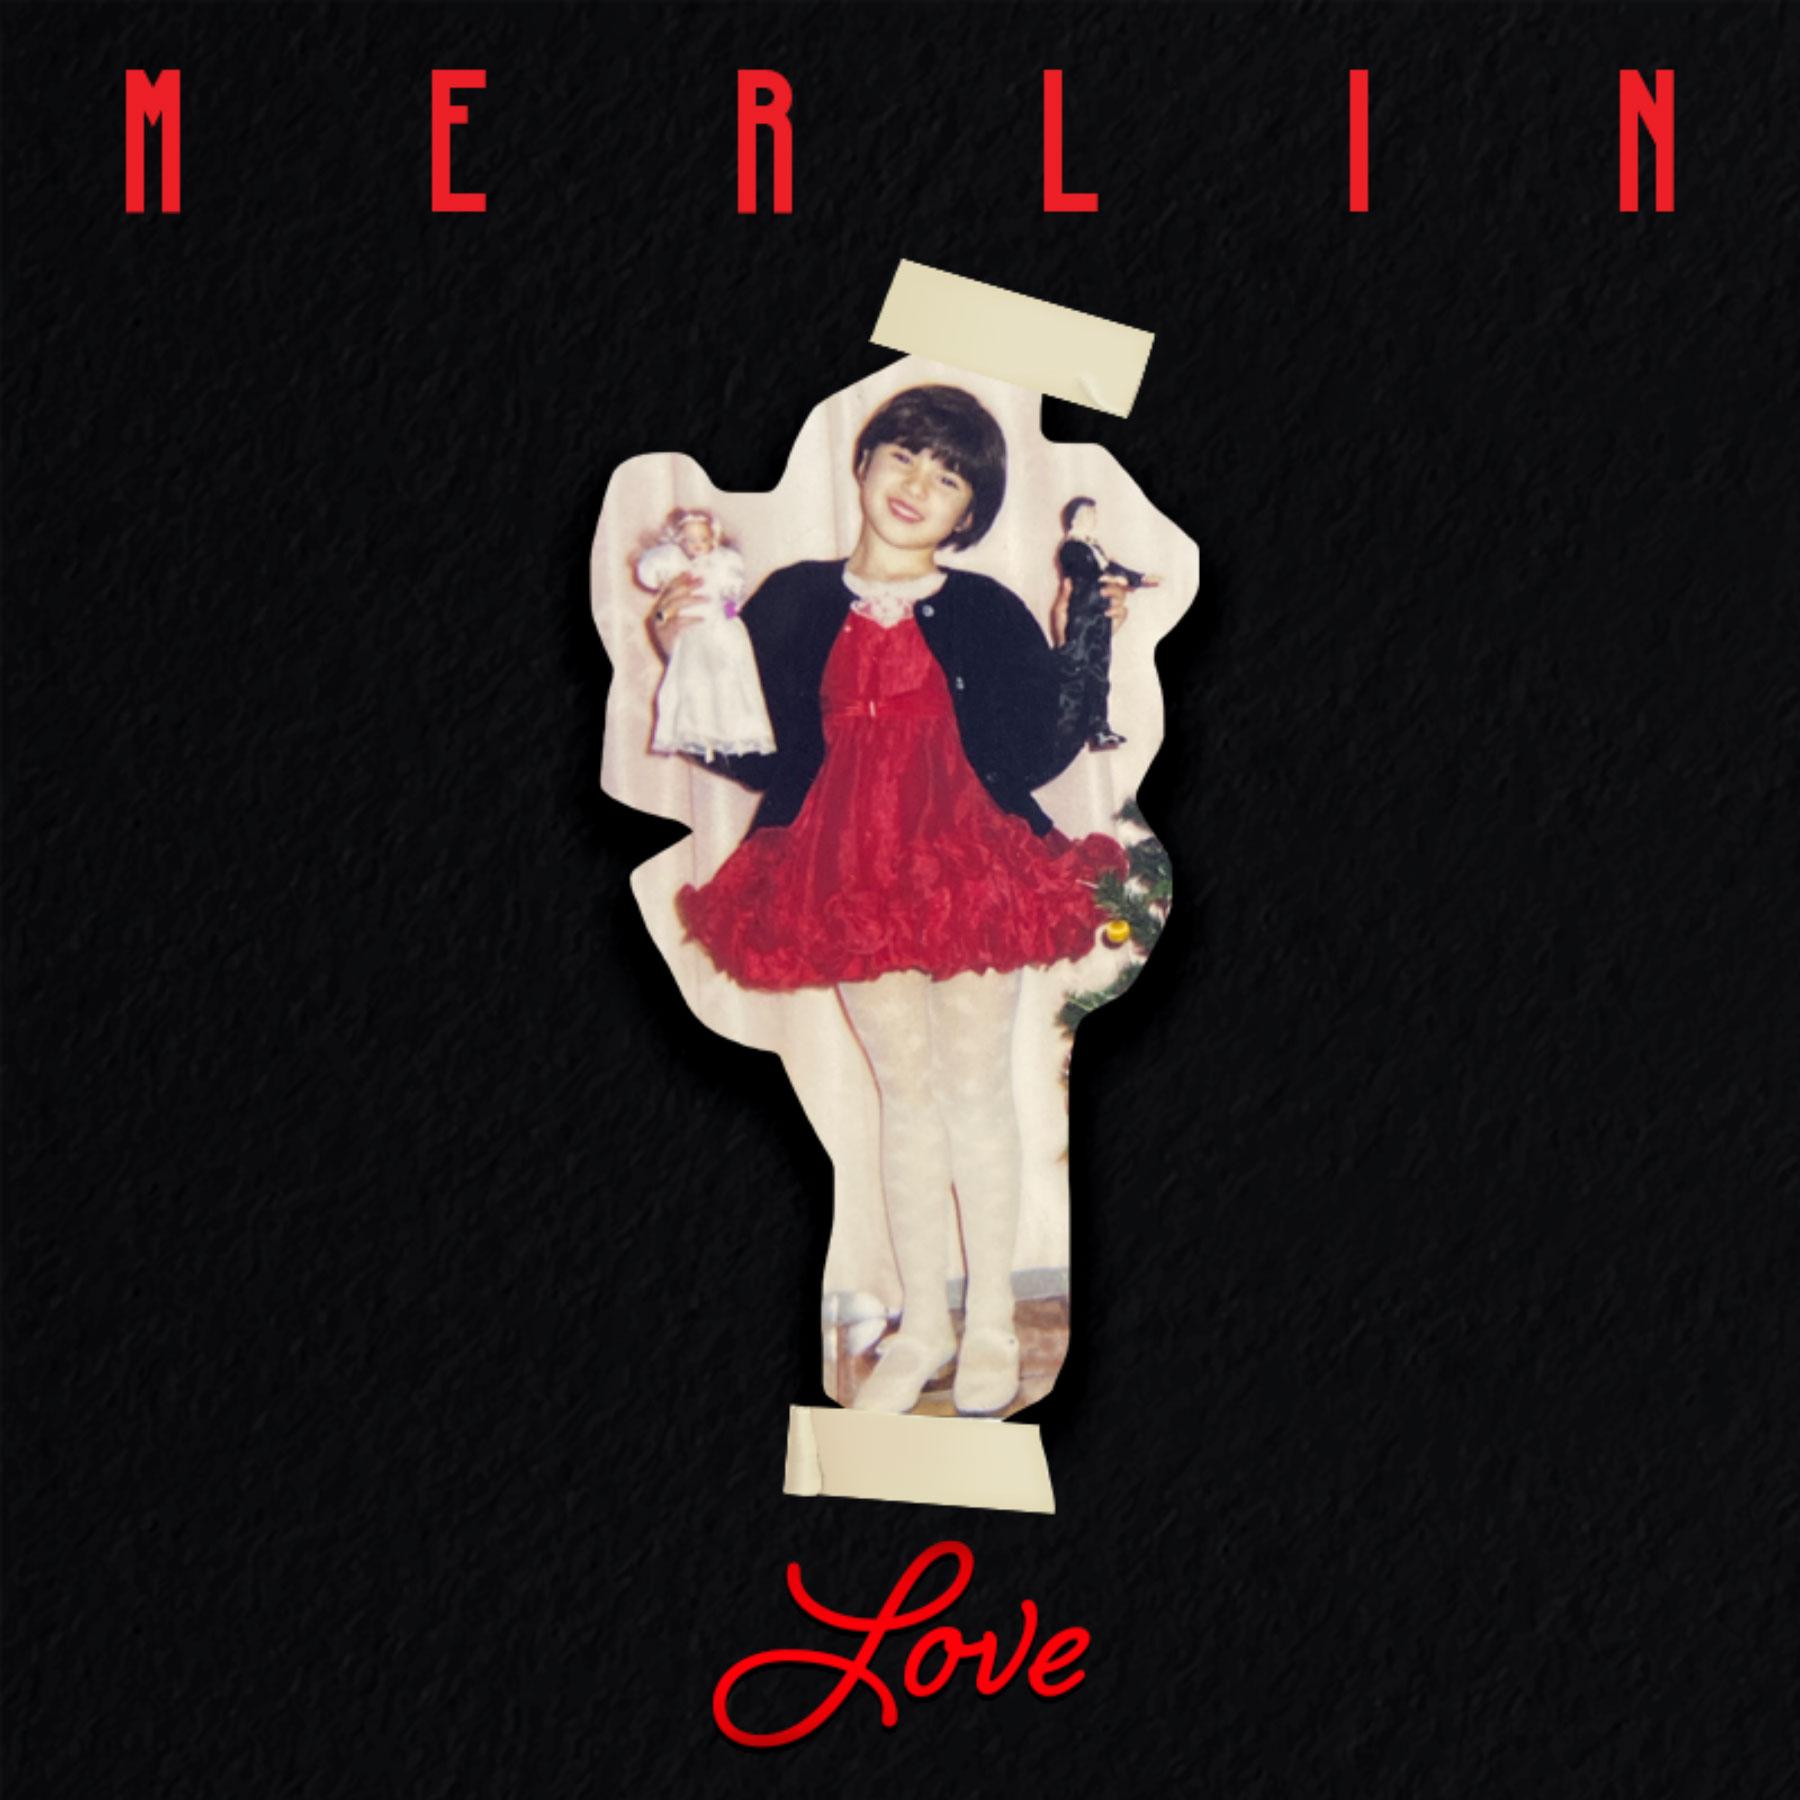 merlin_artworkLove_2